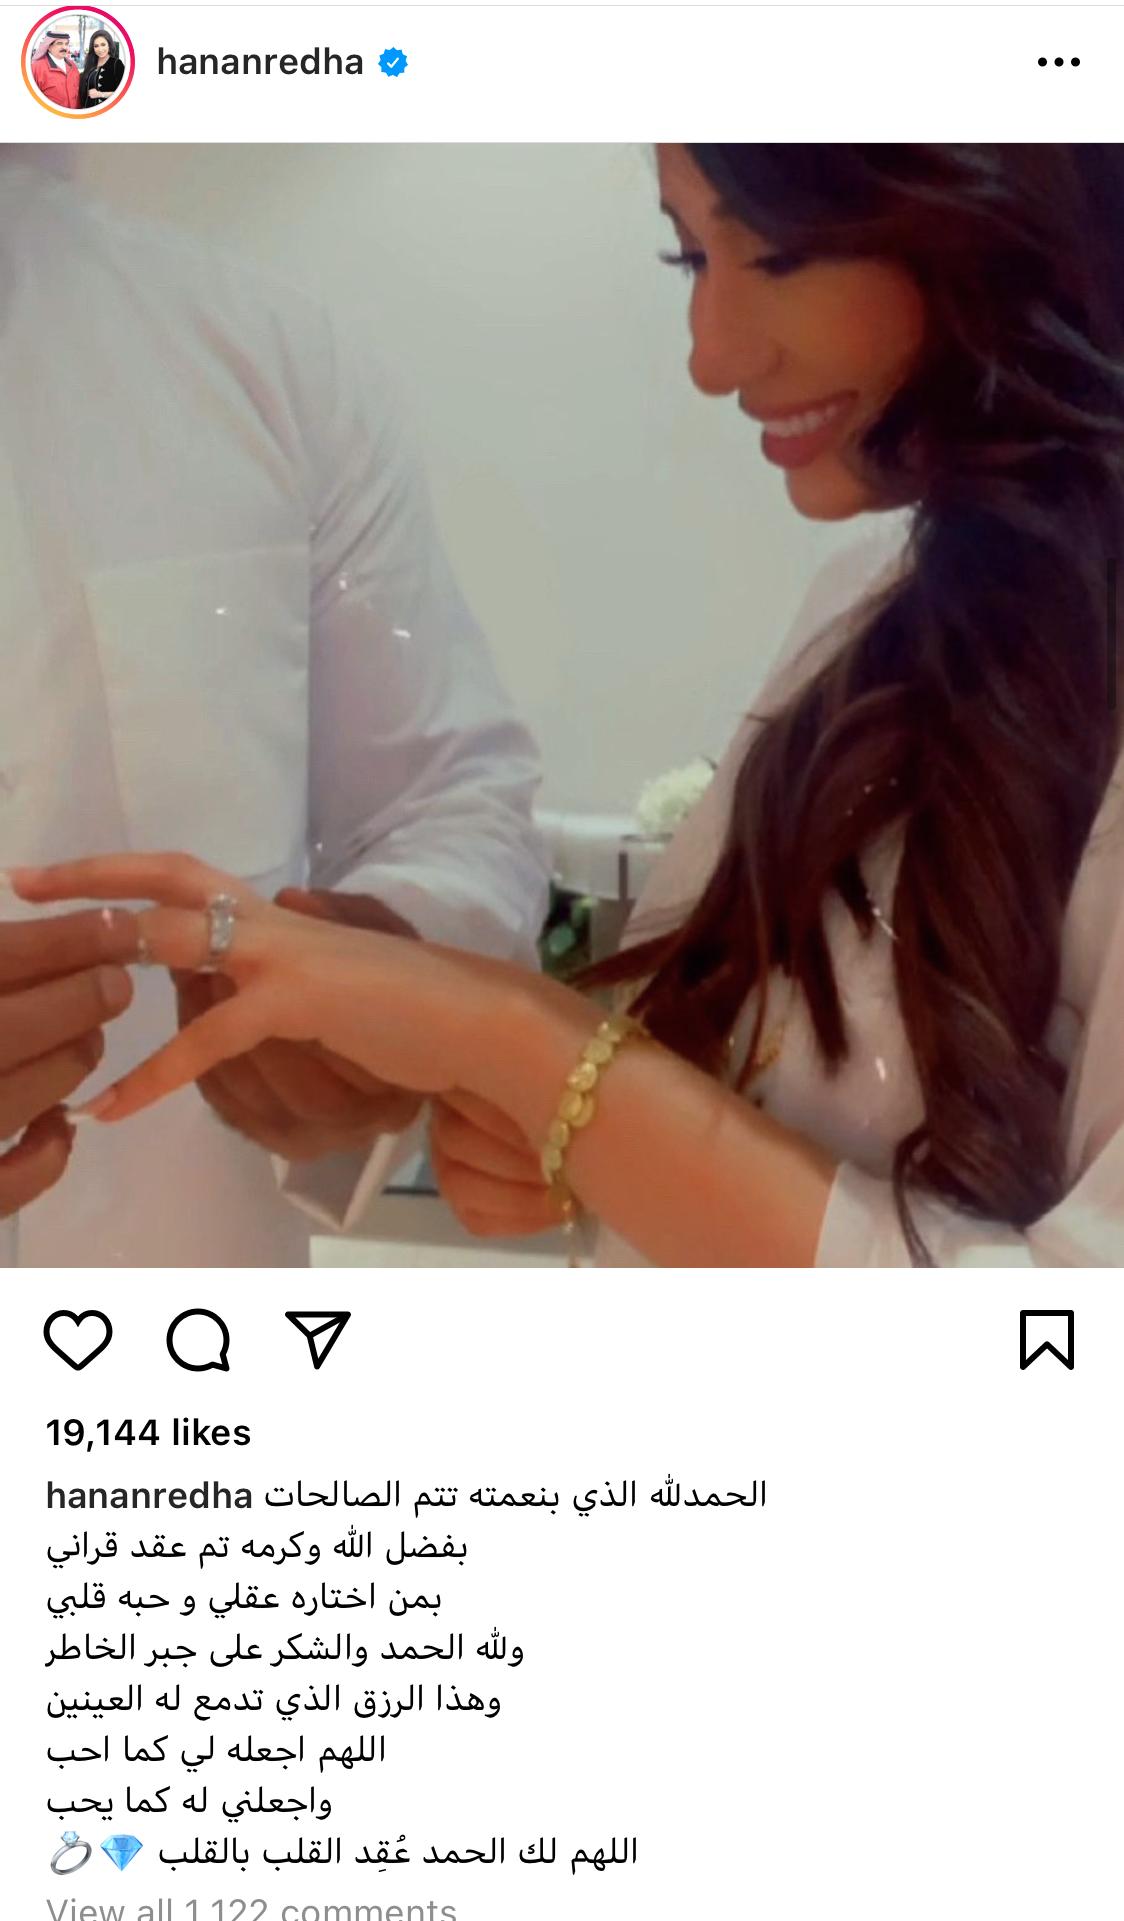 منشور الفنانة حنان رضا للاعلان عن عقد قرانها